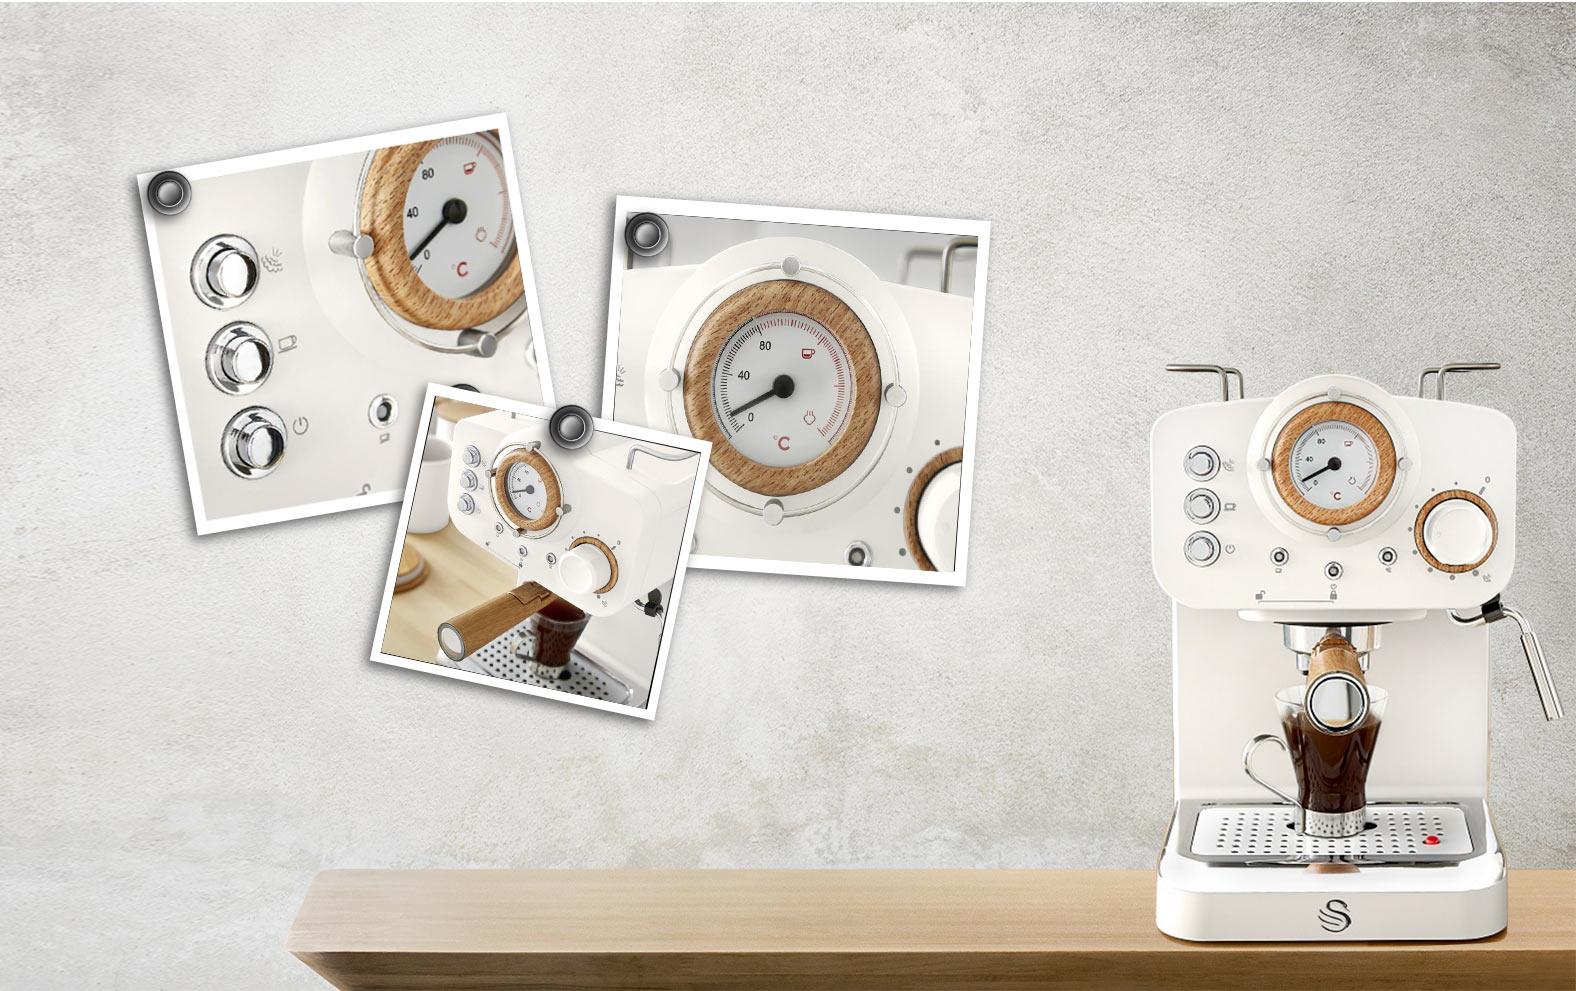 Swan Pump Espresso Coffee Machine - Άσπρο - - SK22110WHTN